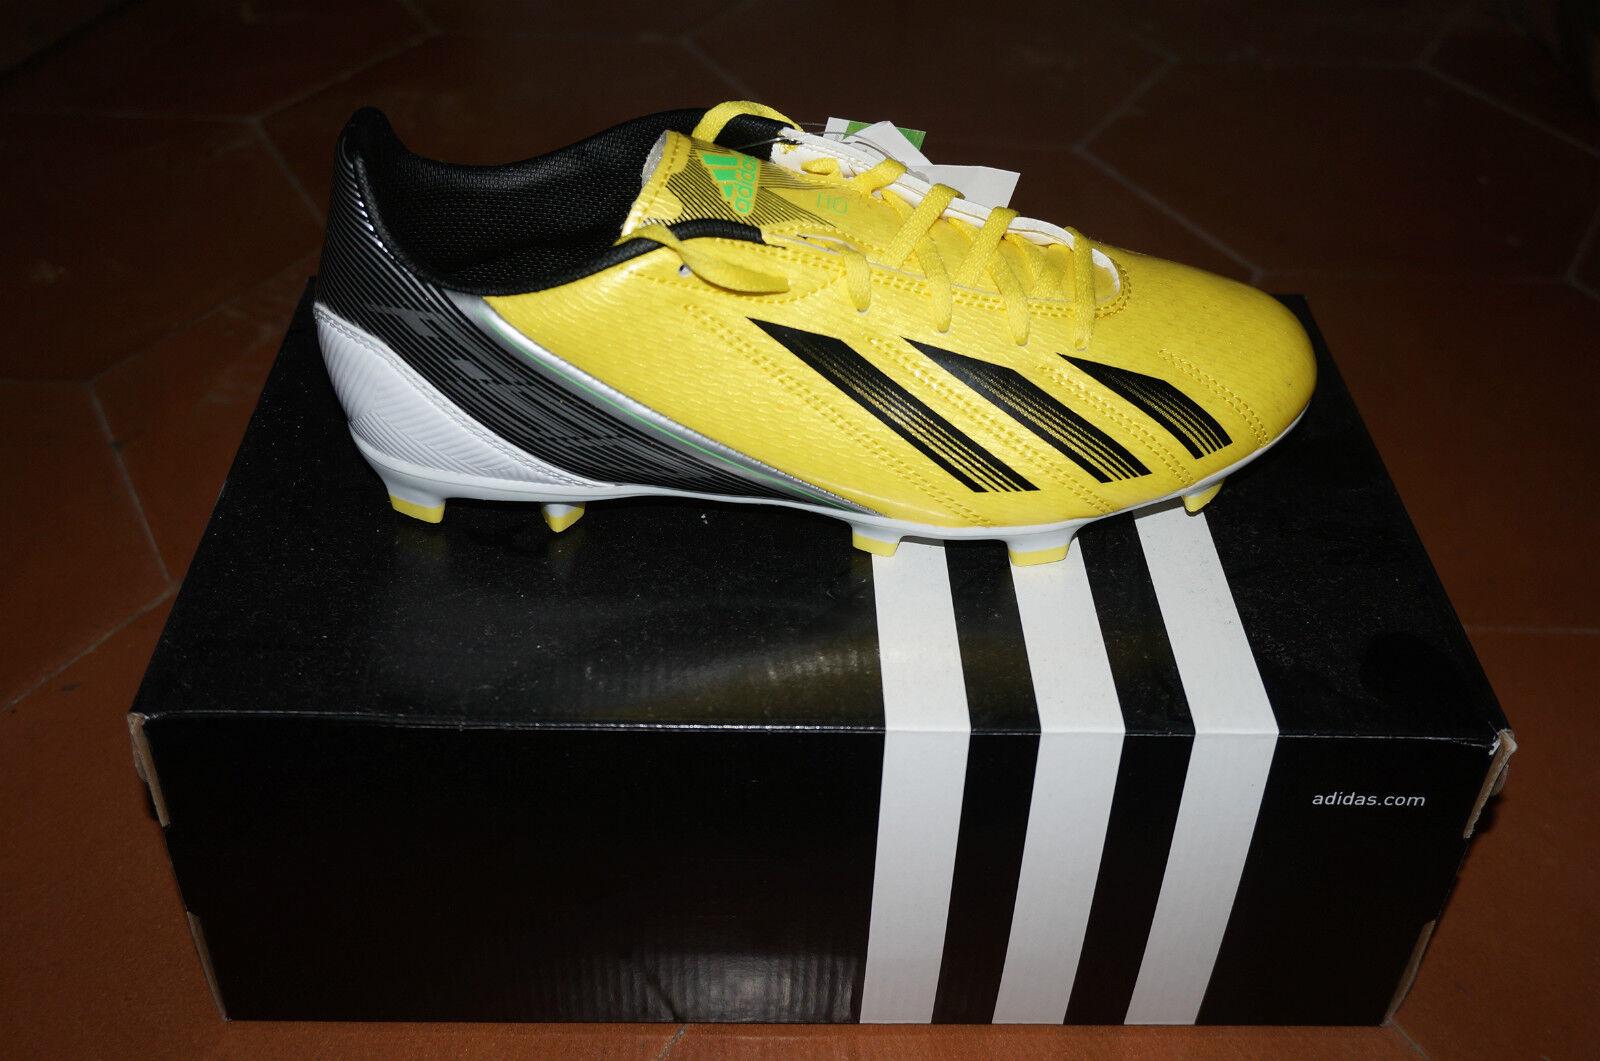 Adidas F10 TRX Fg Sautope Originali Futbol Gituttio Sautope classeiche da uomo